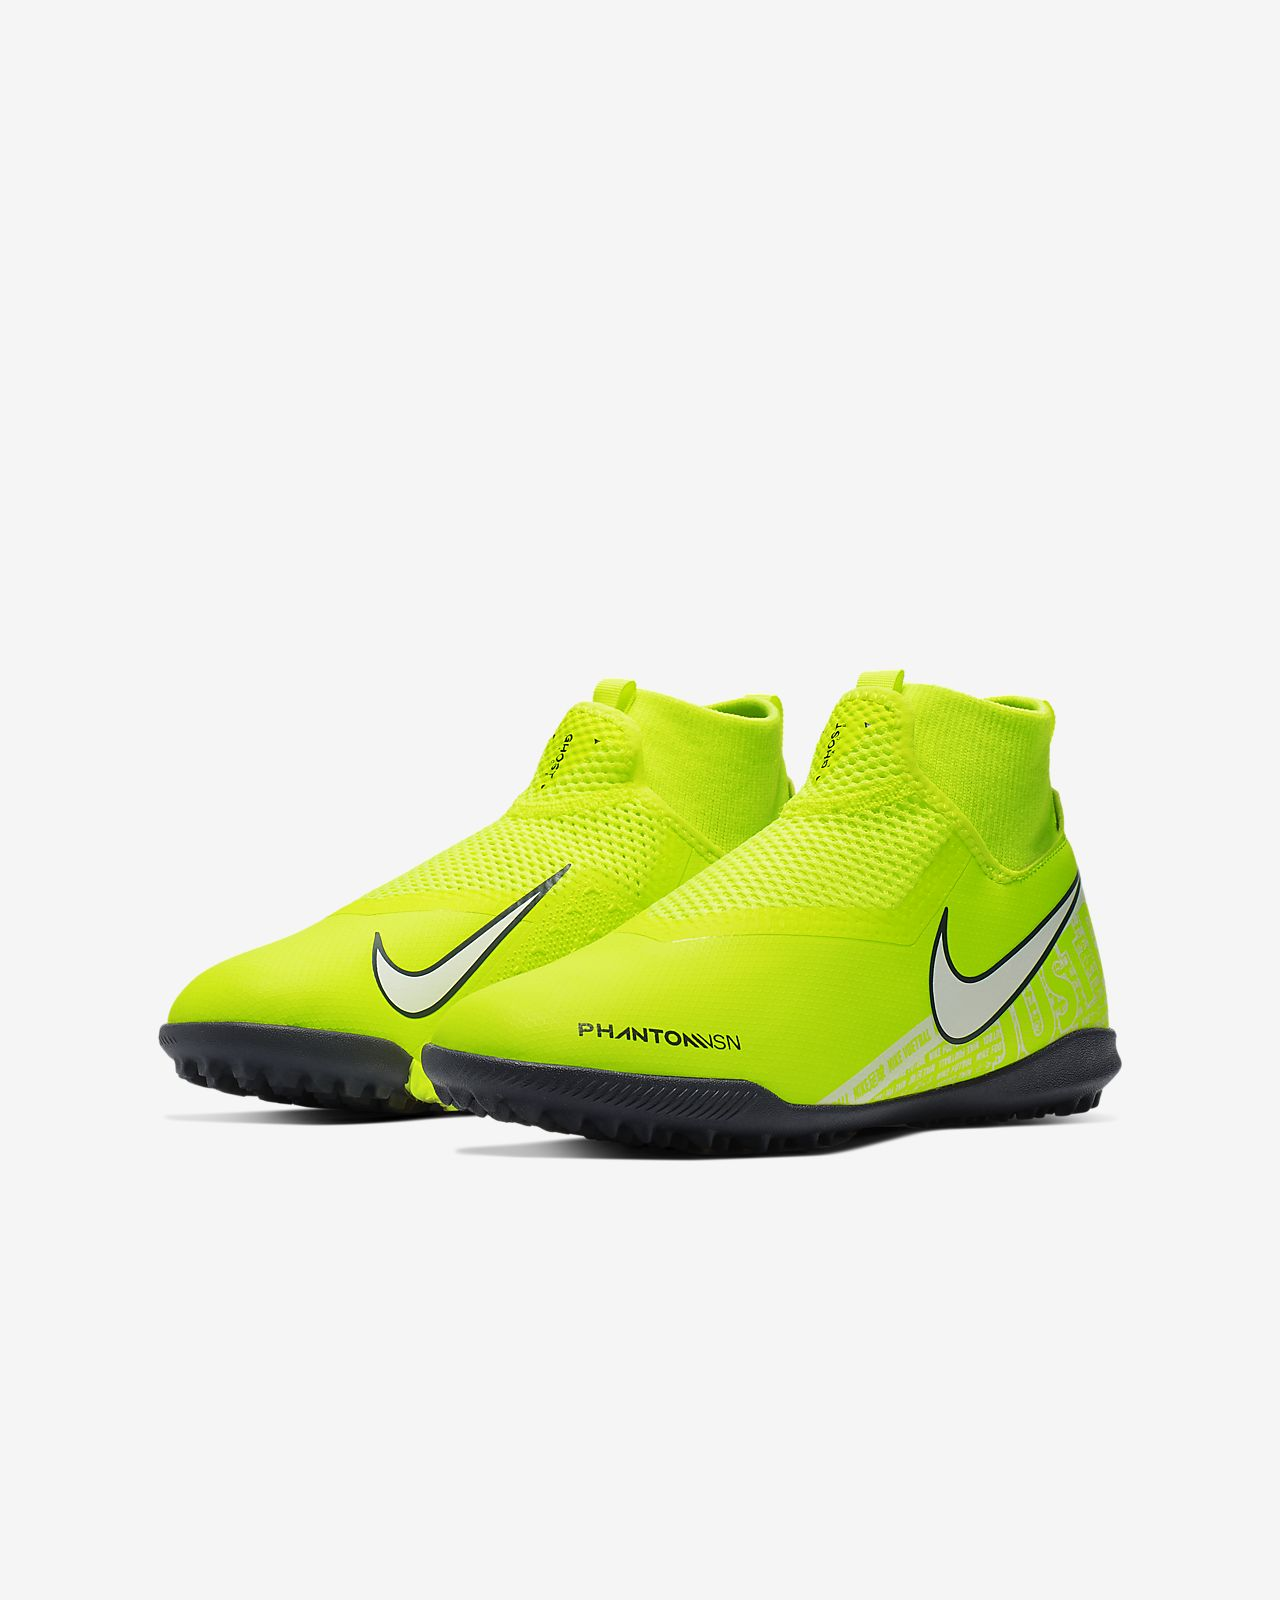 Scarpa da calcio per erba sintetica Nike Jr. Phantom Vision Academy Dynamic Fit BambiniRagazzi